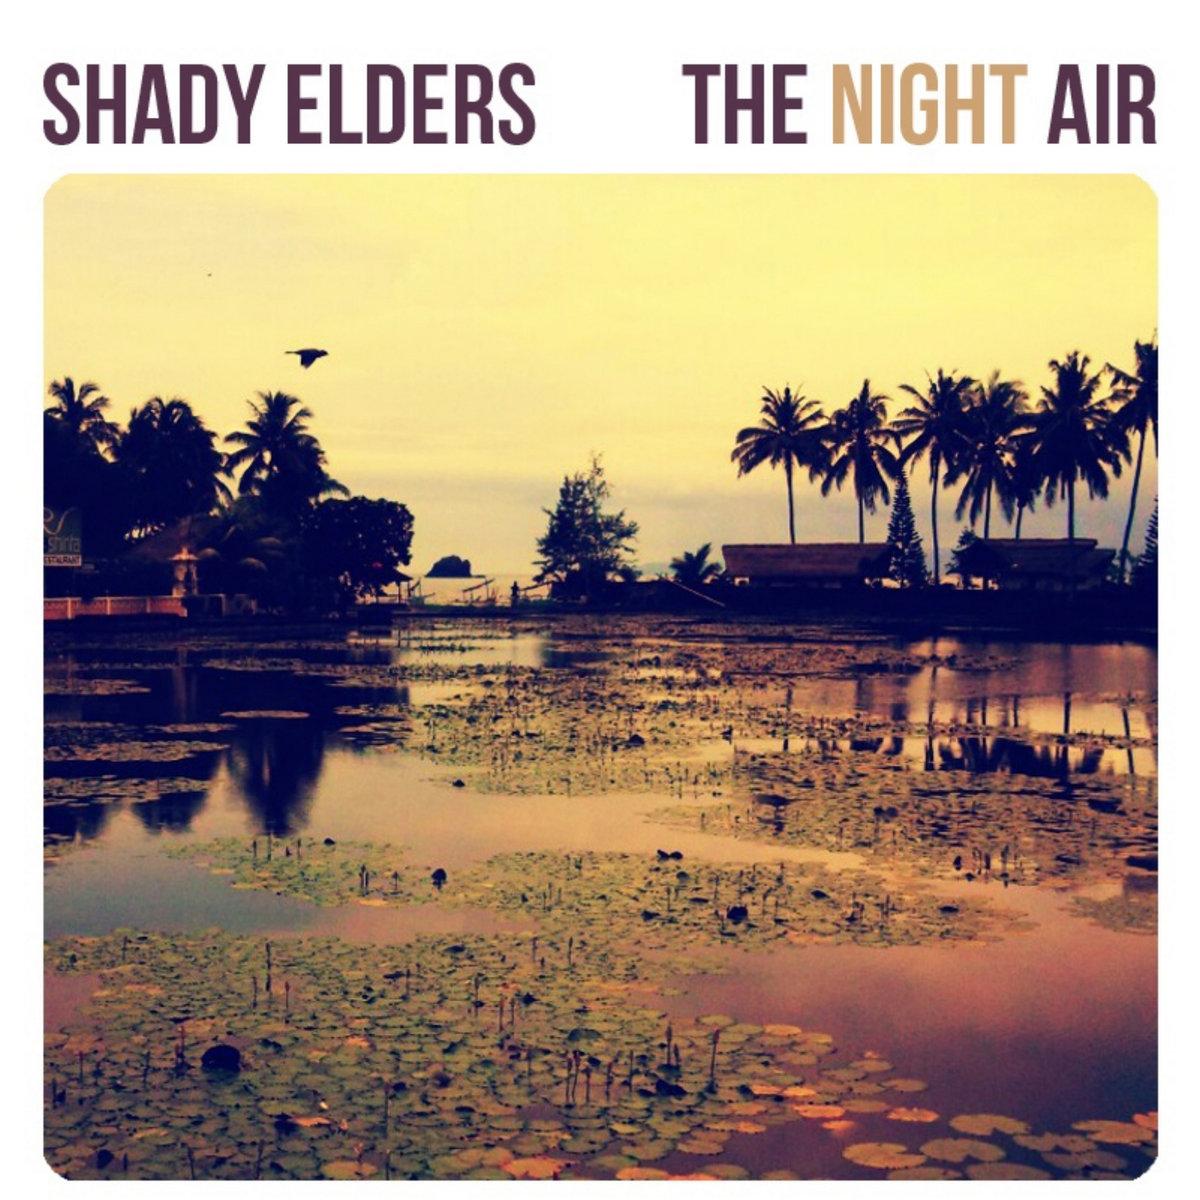 The Night Air EP – Shady Elders